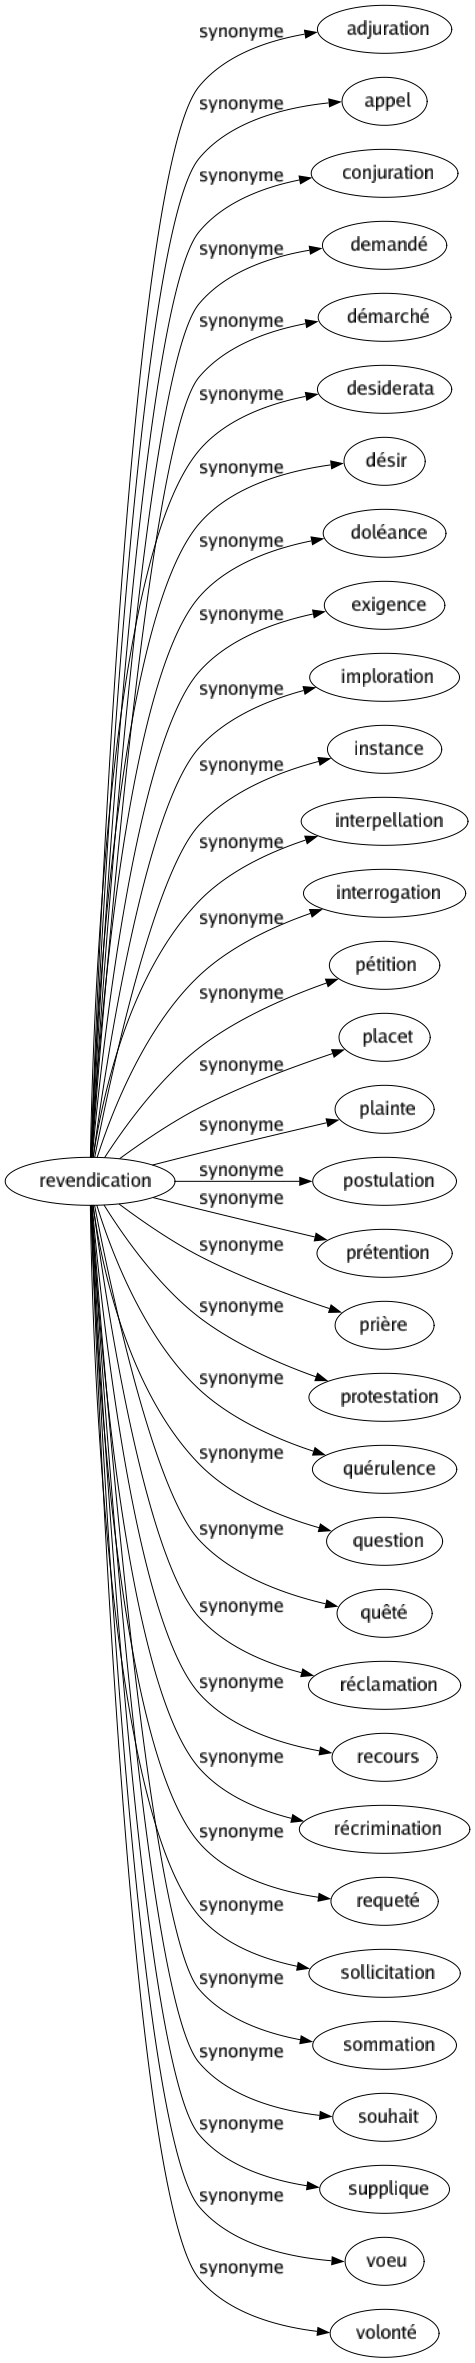 Revendication Synonyme